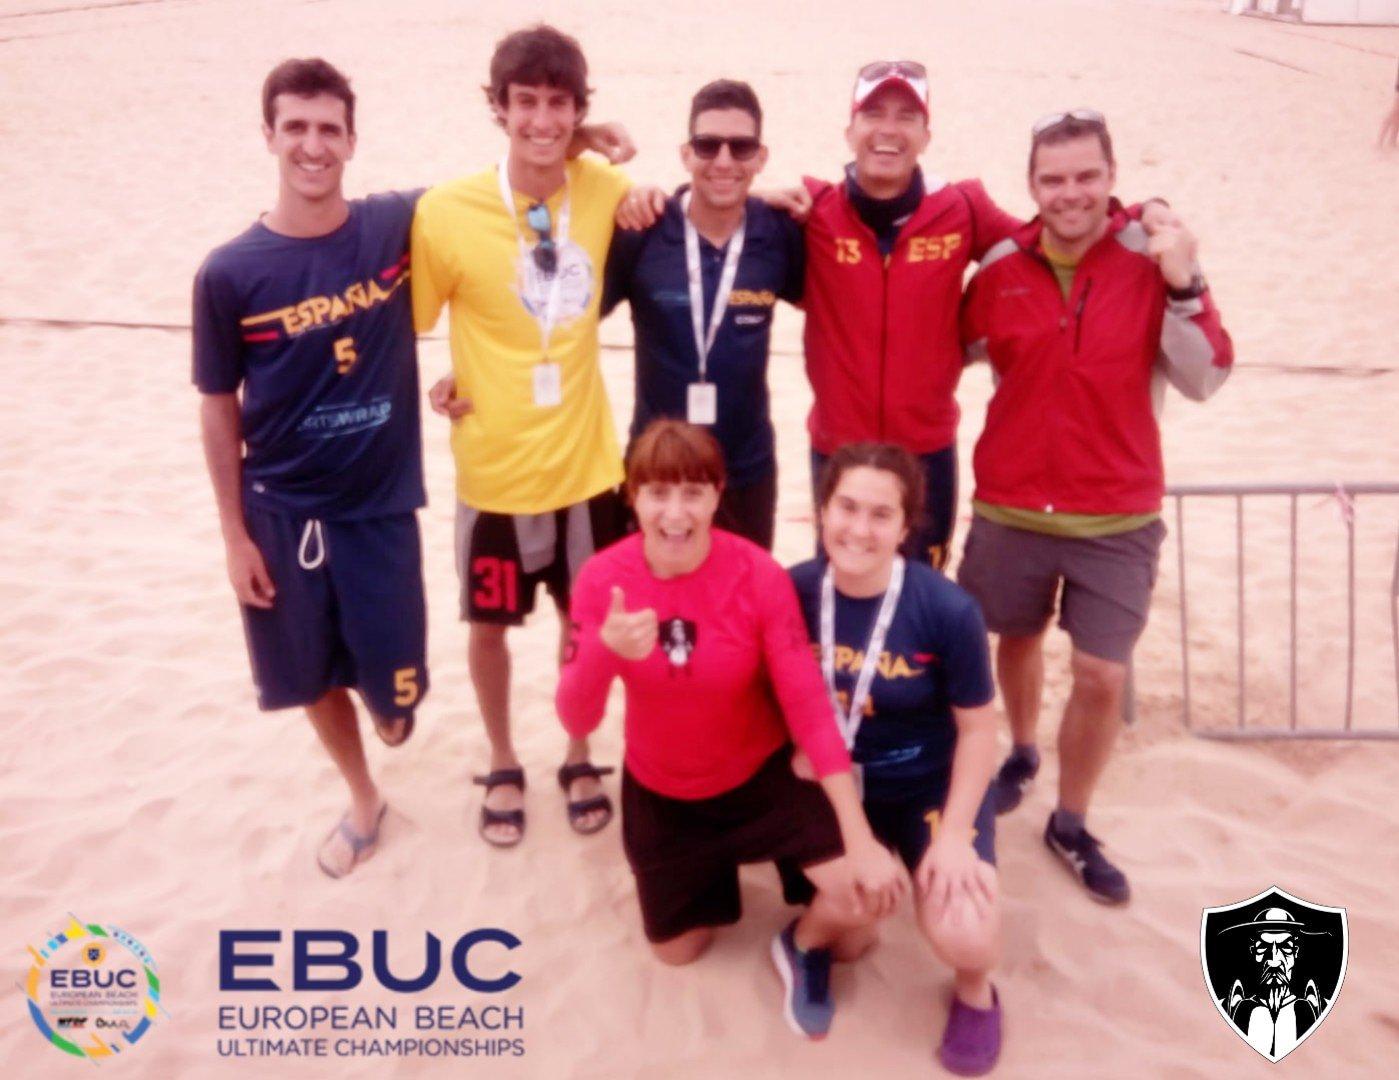 #JUEVES ? La semana avanza en los @EBUC2019 ? https://t.co/Usr6h6SMAs <a href='https://twitter.com/QmasD/status/1126586088636784646/photo/1' target='_blank'>See original »</a>